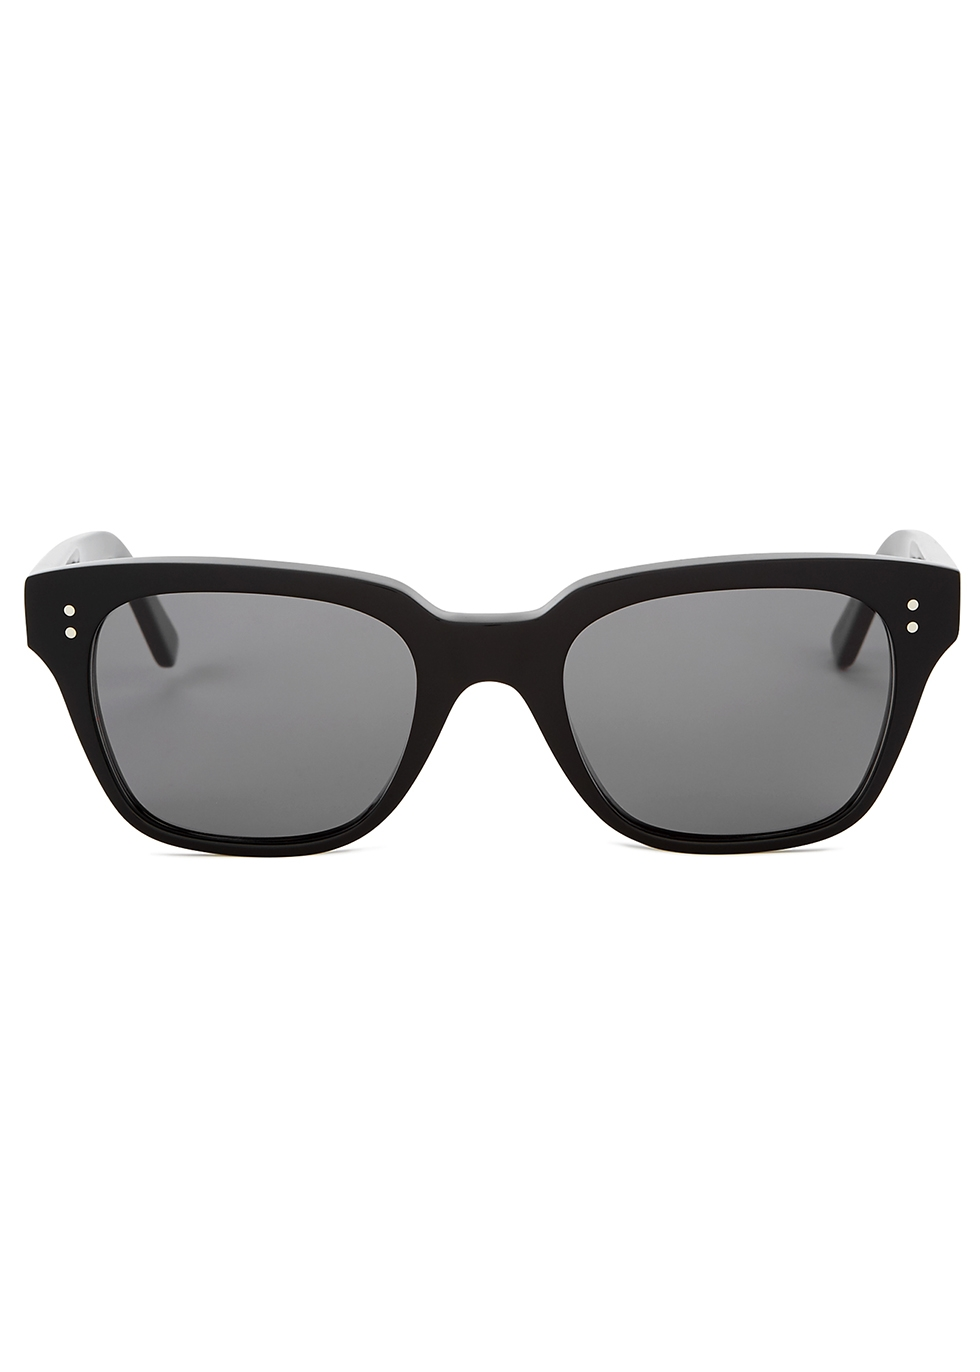 03825e2699b Maui Lens Koki Sunglasses Womens 11t Beach Mens Grey 433 Jim And Black Frame  Tortoise Neutral ... Burberry ...